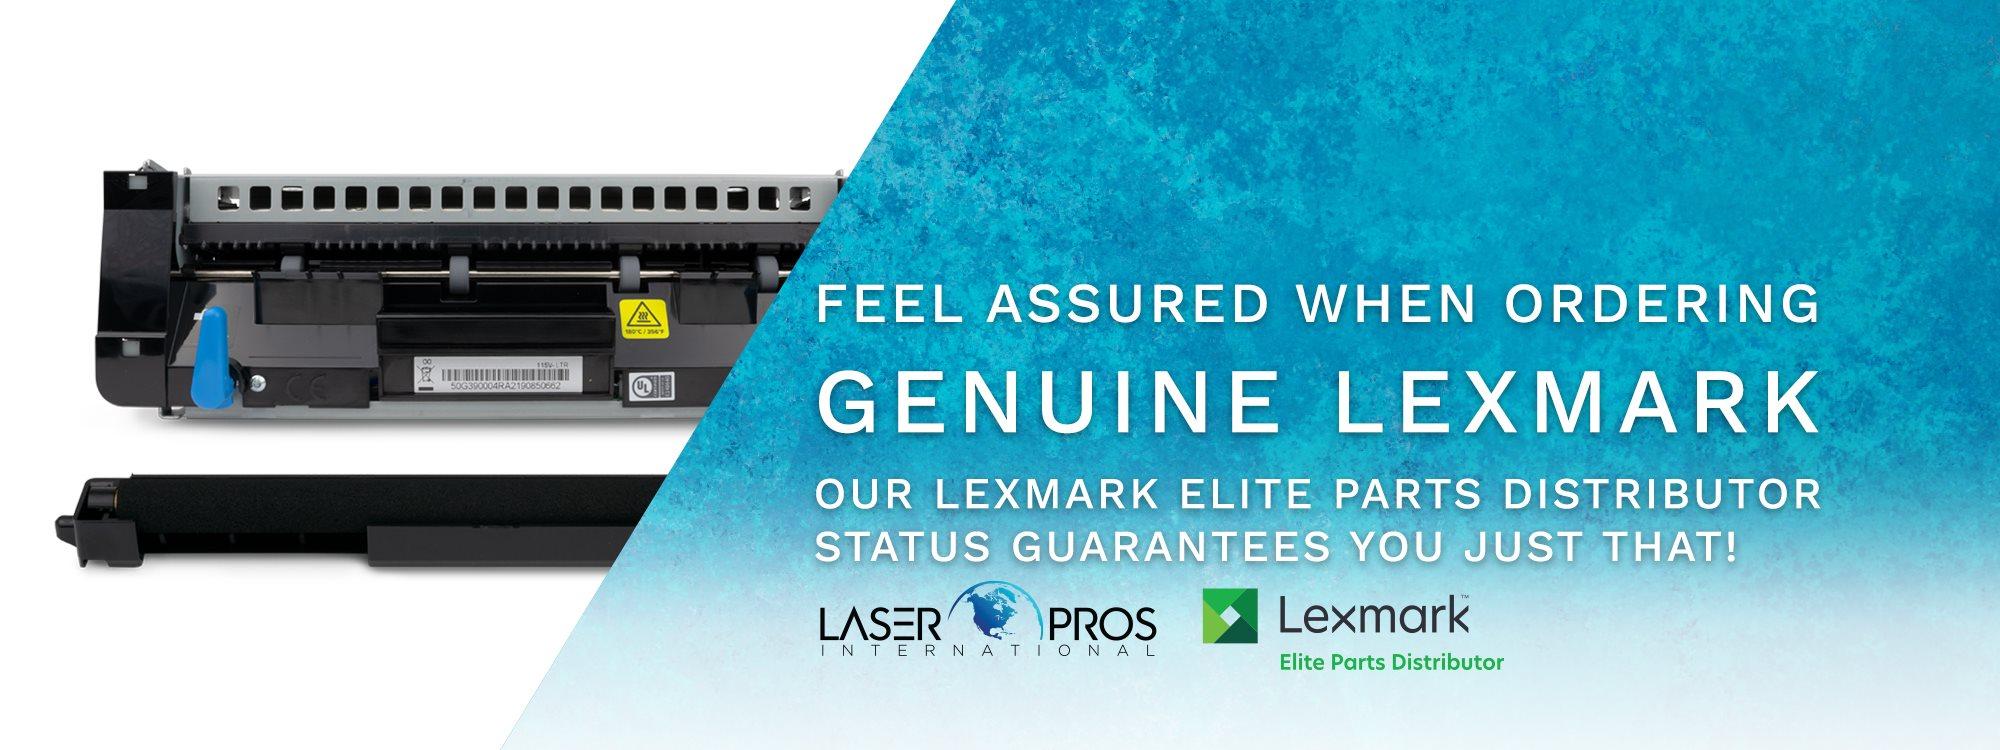 Laser Pros International is your Lexmark Elite Parts Distributor